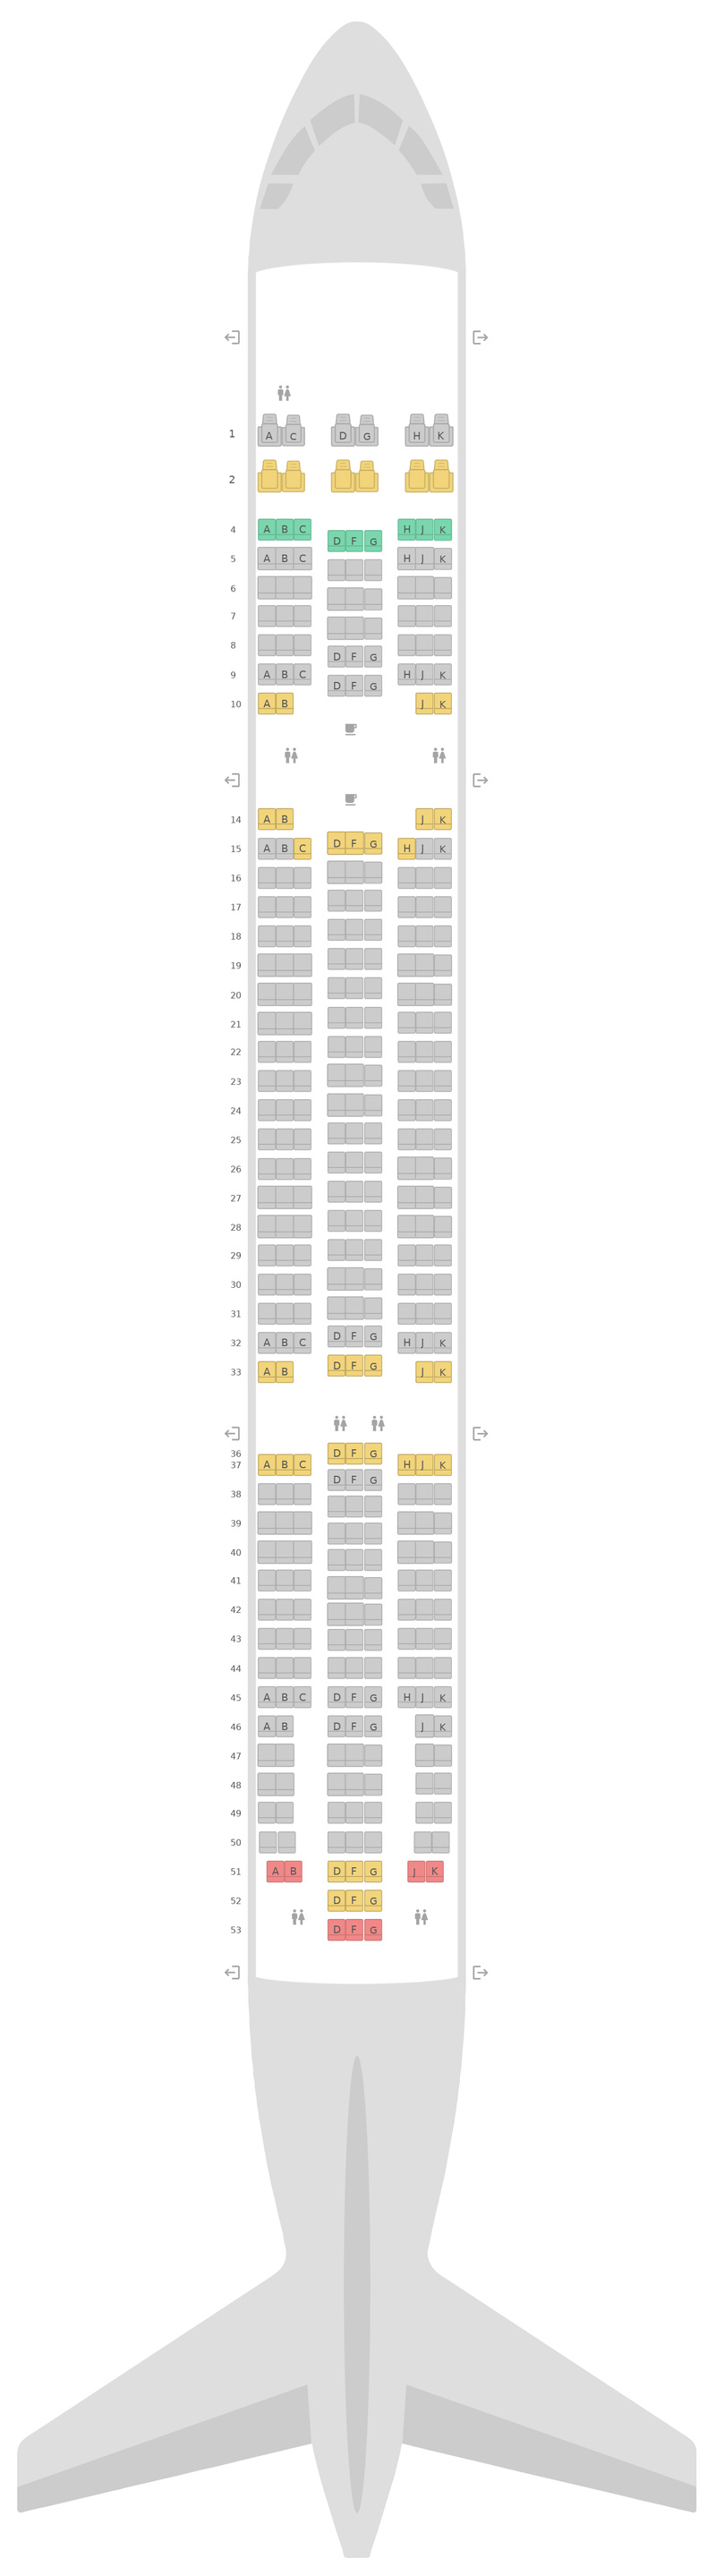 Seat Map Air Transat Airbus A330-300 (333) v1